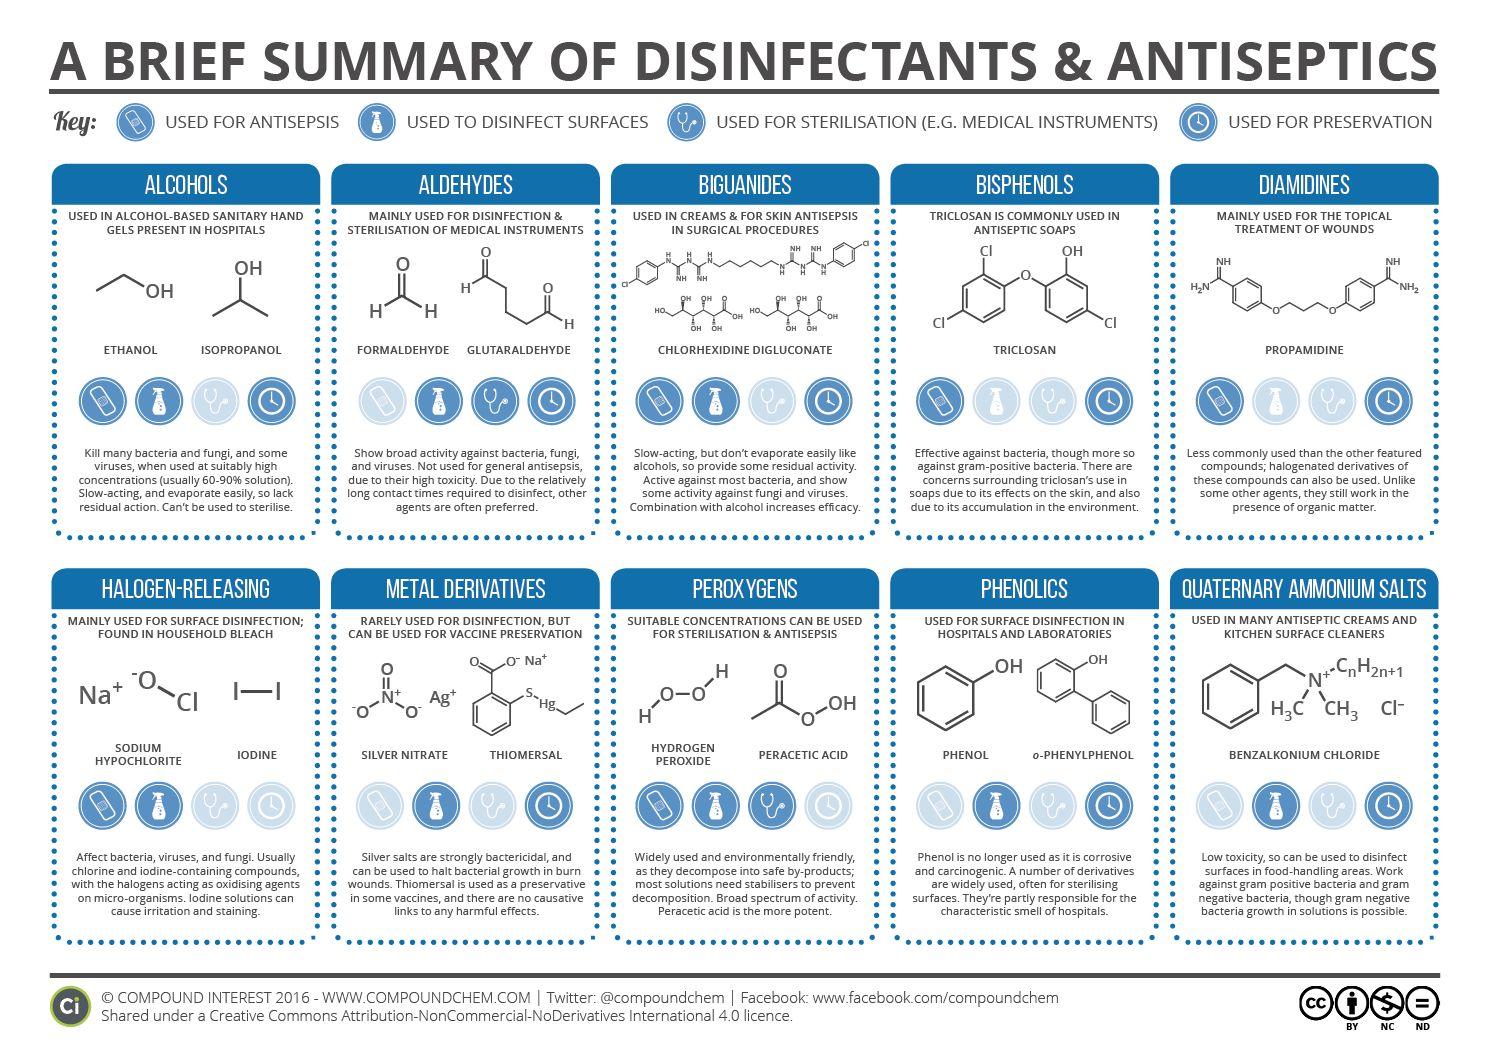 Classes of Disinfectants & Antiseptics